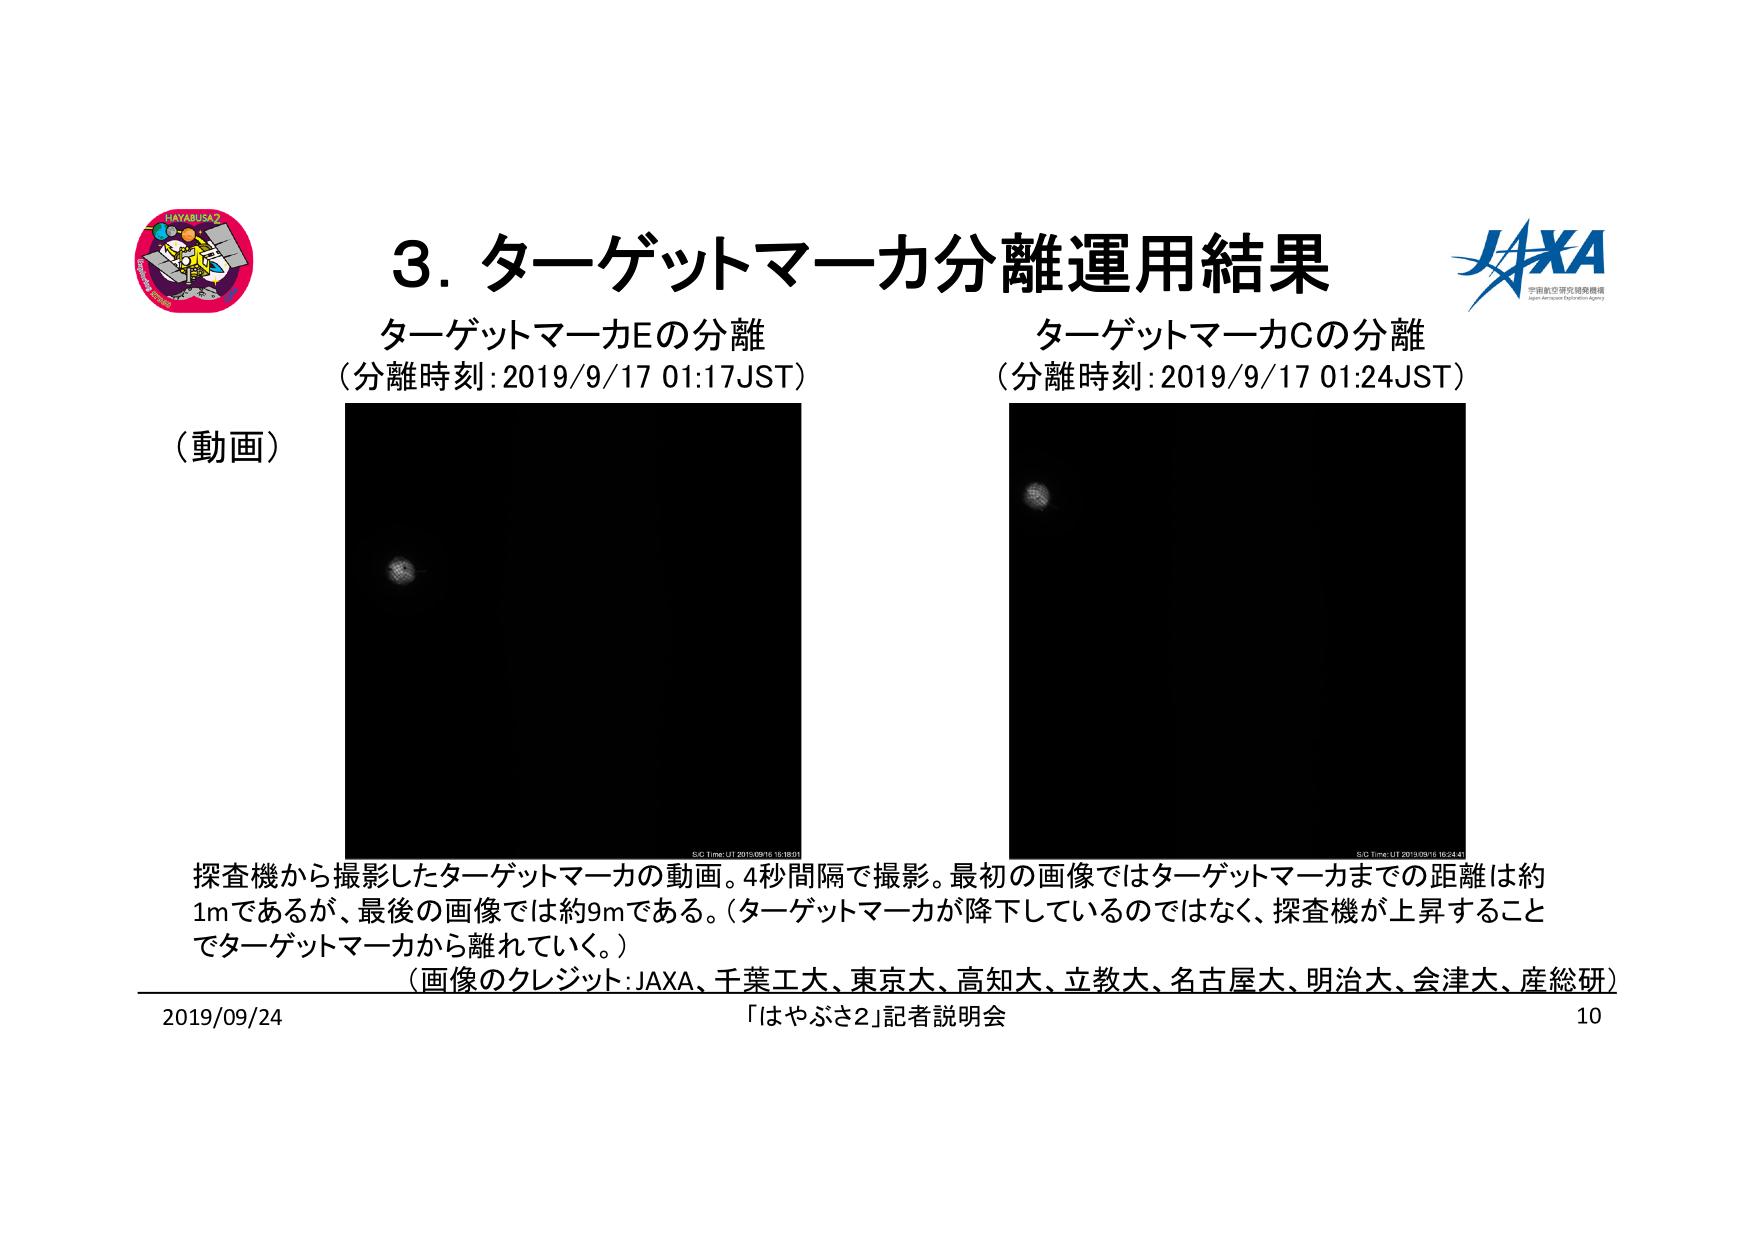 f:id:Imamura:20190924122530p:plain